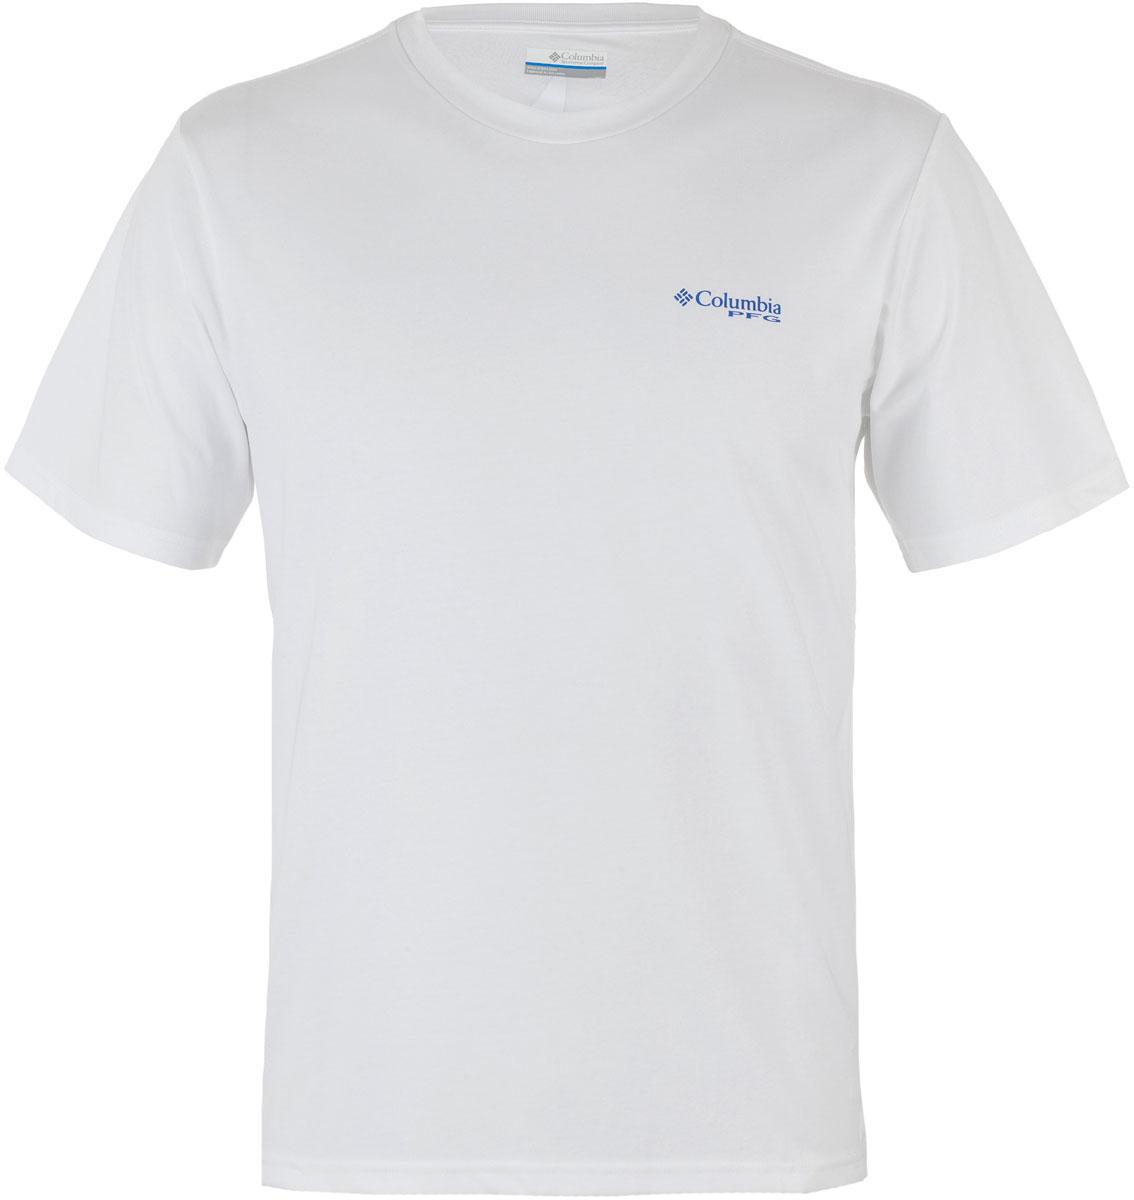 Футболка мужская Columbia PFG Tools Elements SS T-shirt, цвет: белый. 1717221-100. Размер M (46/48)